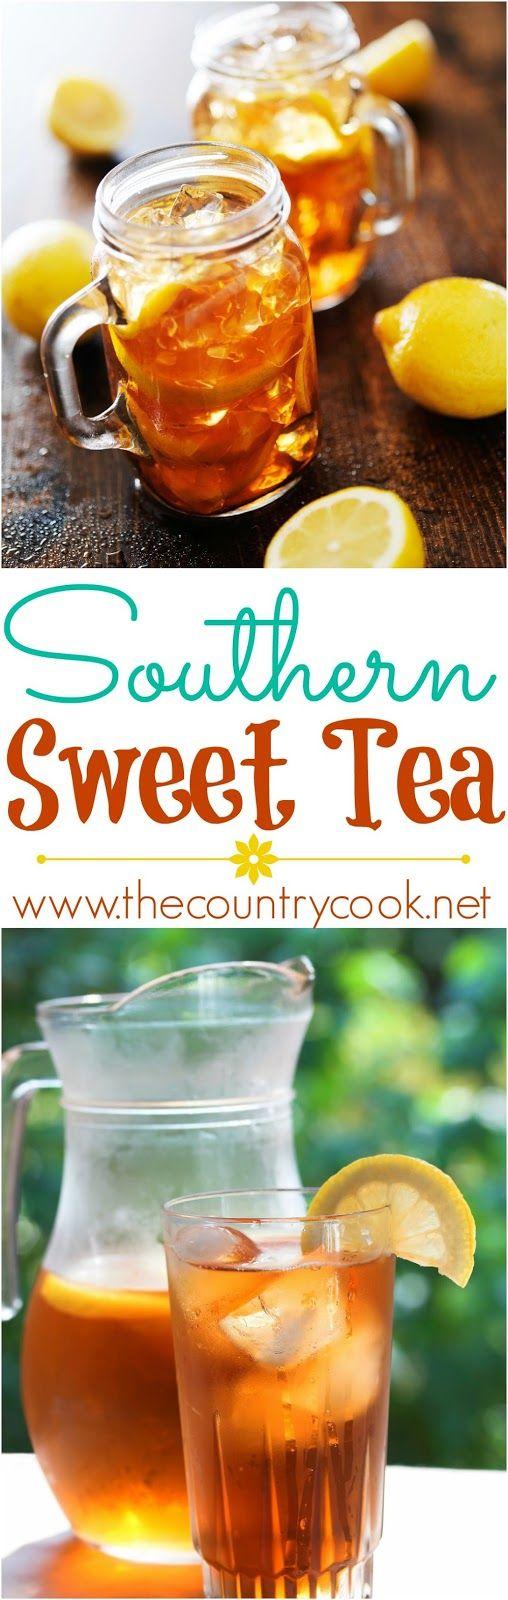 Southern Sweet Tea | Recipe | Bags, Sweet tea and Drinks